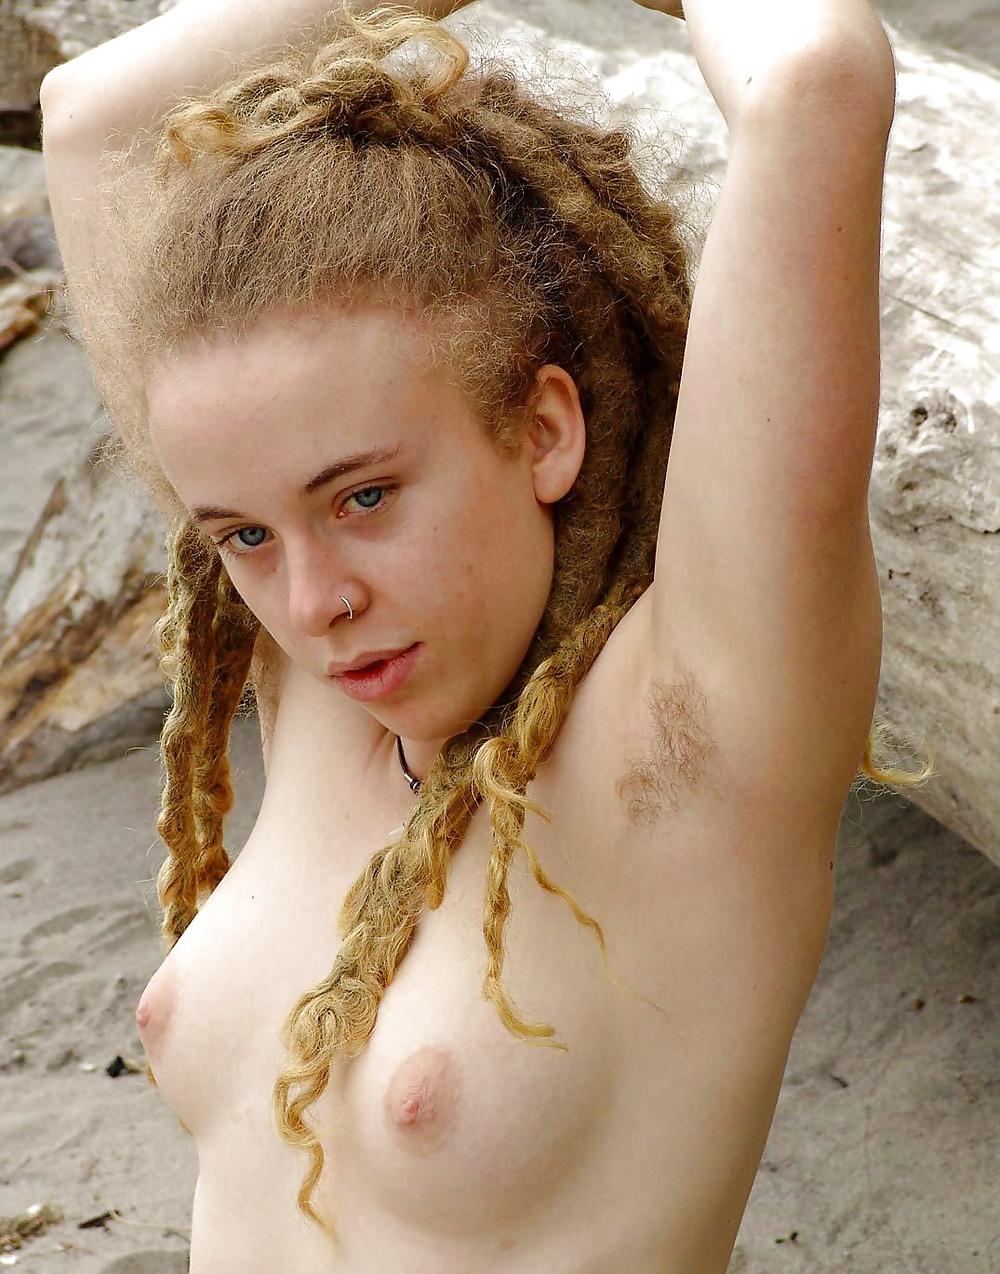 Naked dreadlock sweet hot sexy girl photo gallery